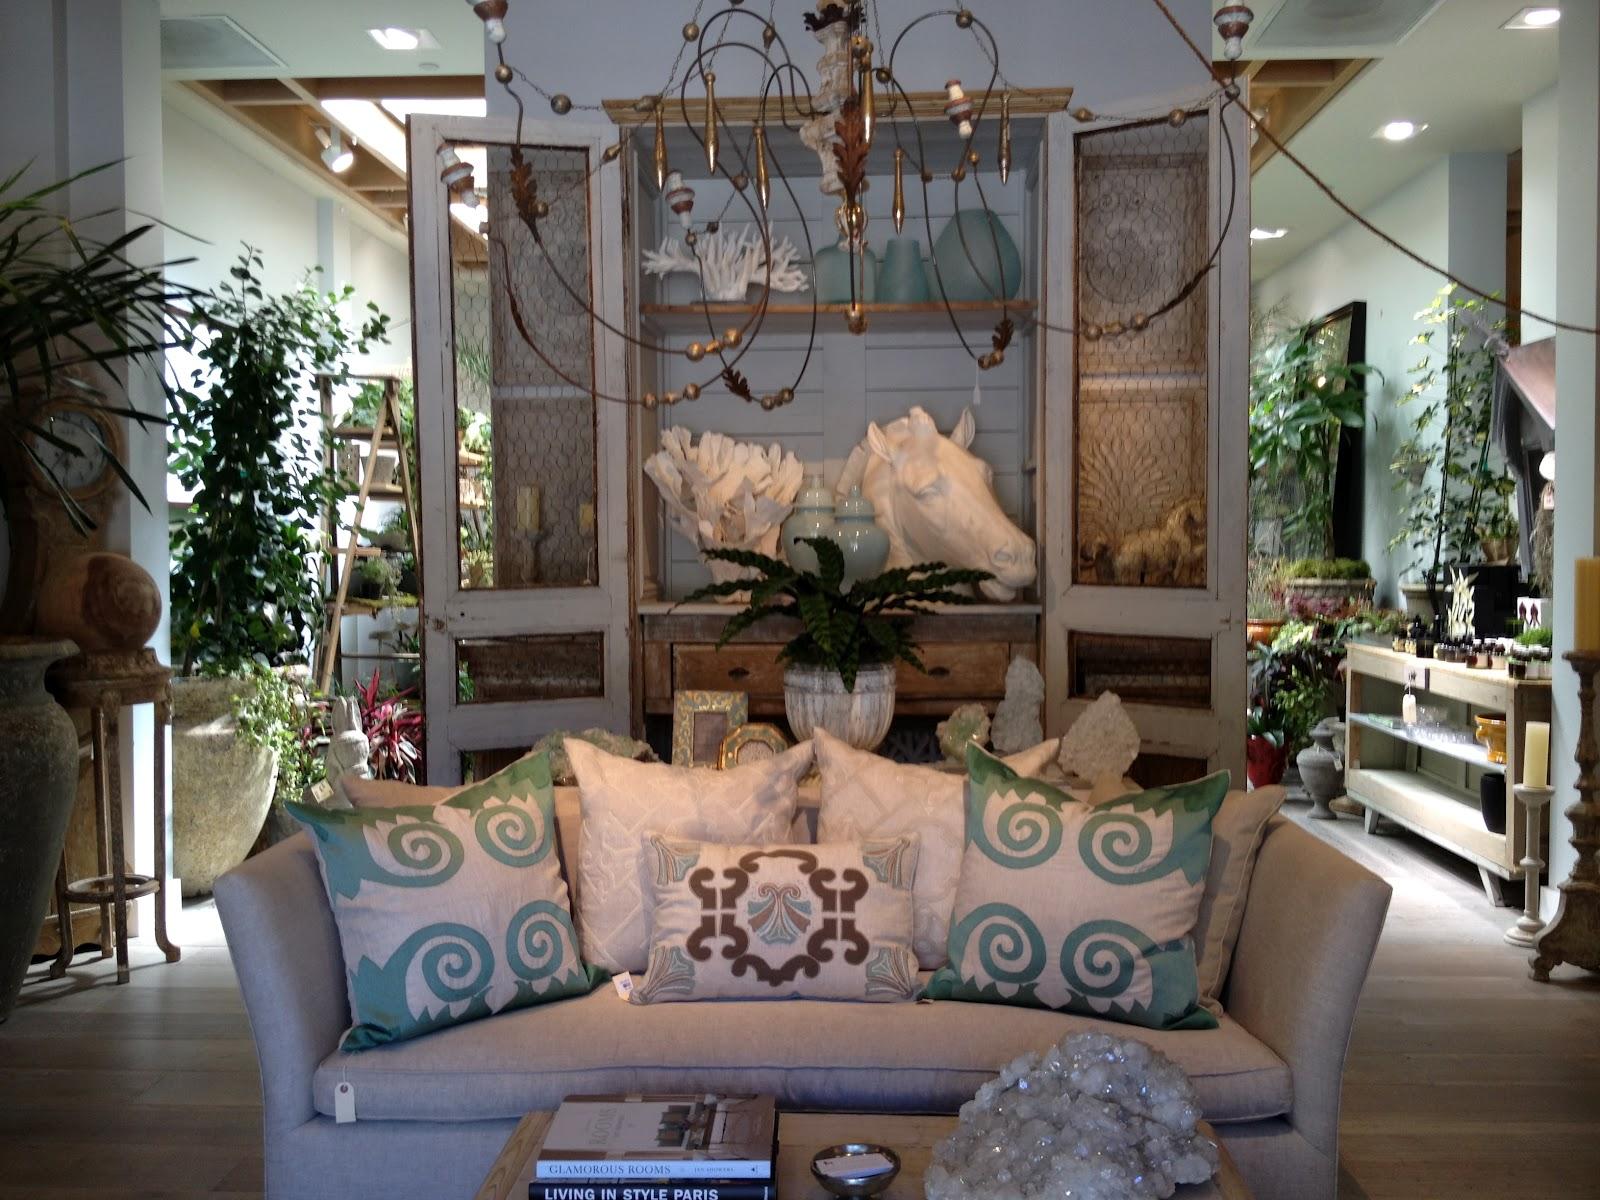 vignette design: Bliss Home And Design